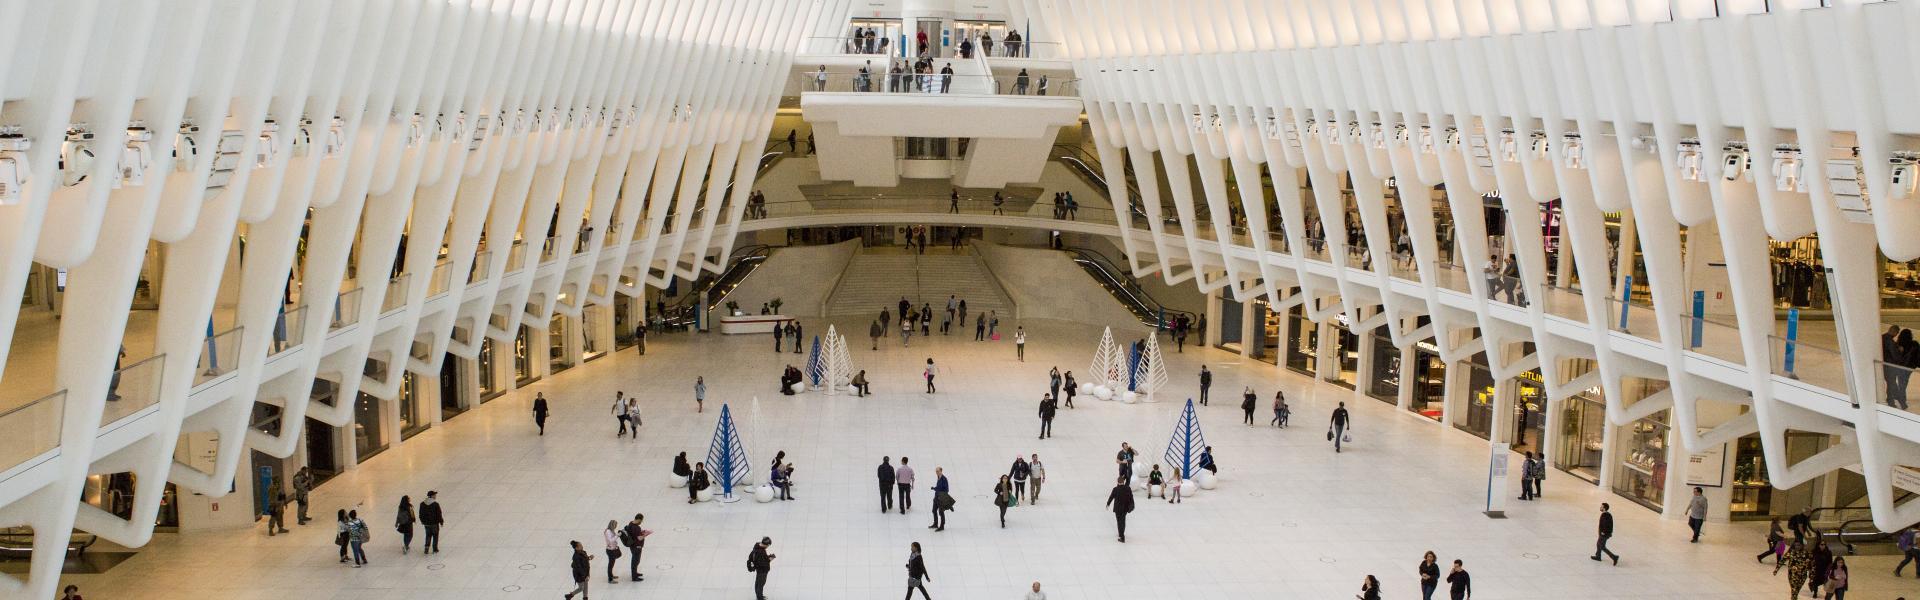 oculus, lowermanhattan, Manhattan, nyc, brittany petronella,